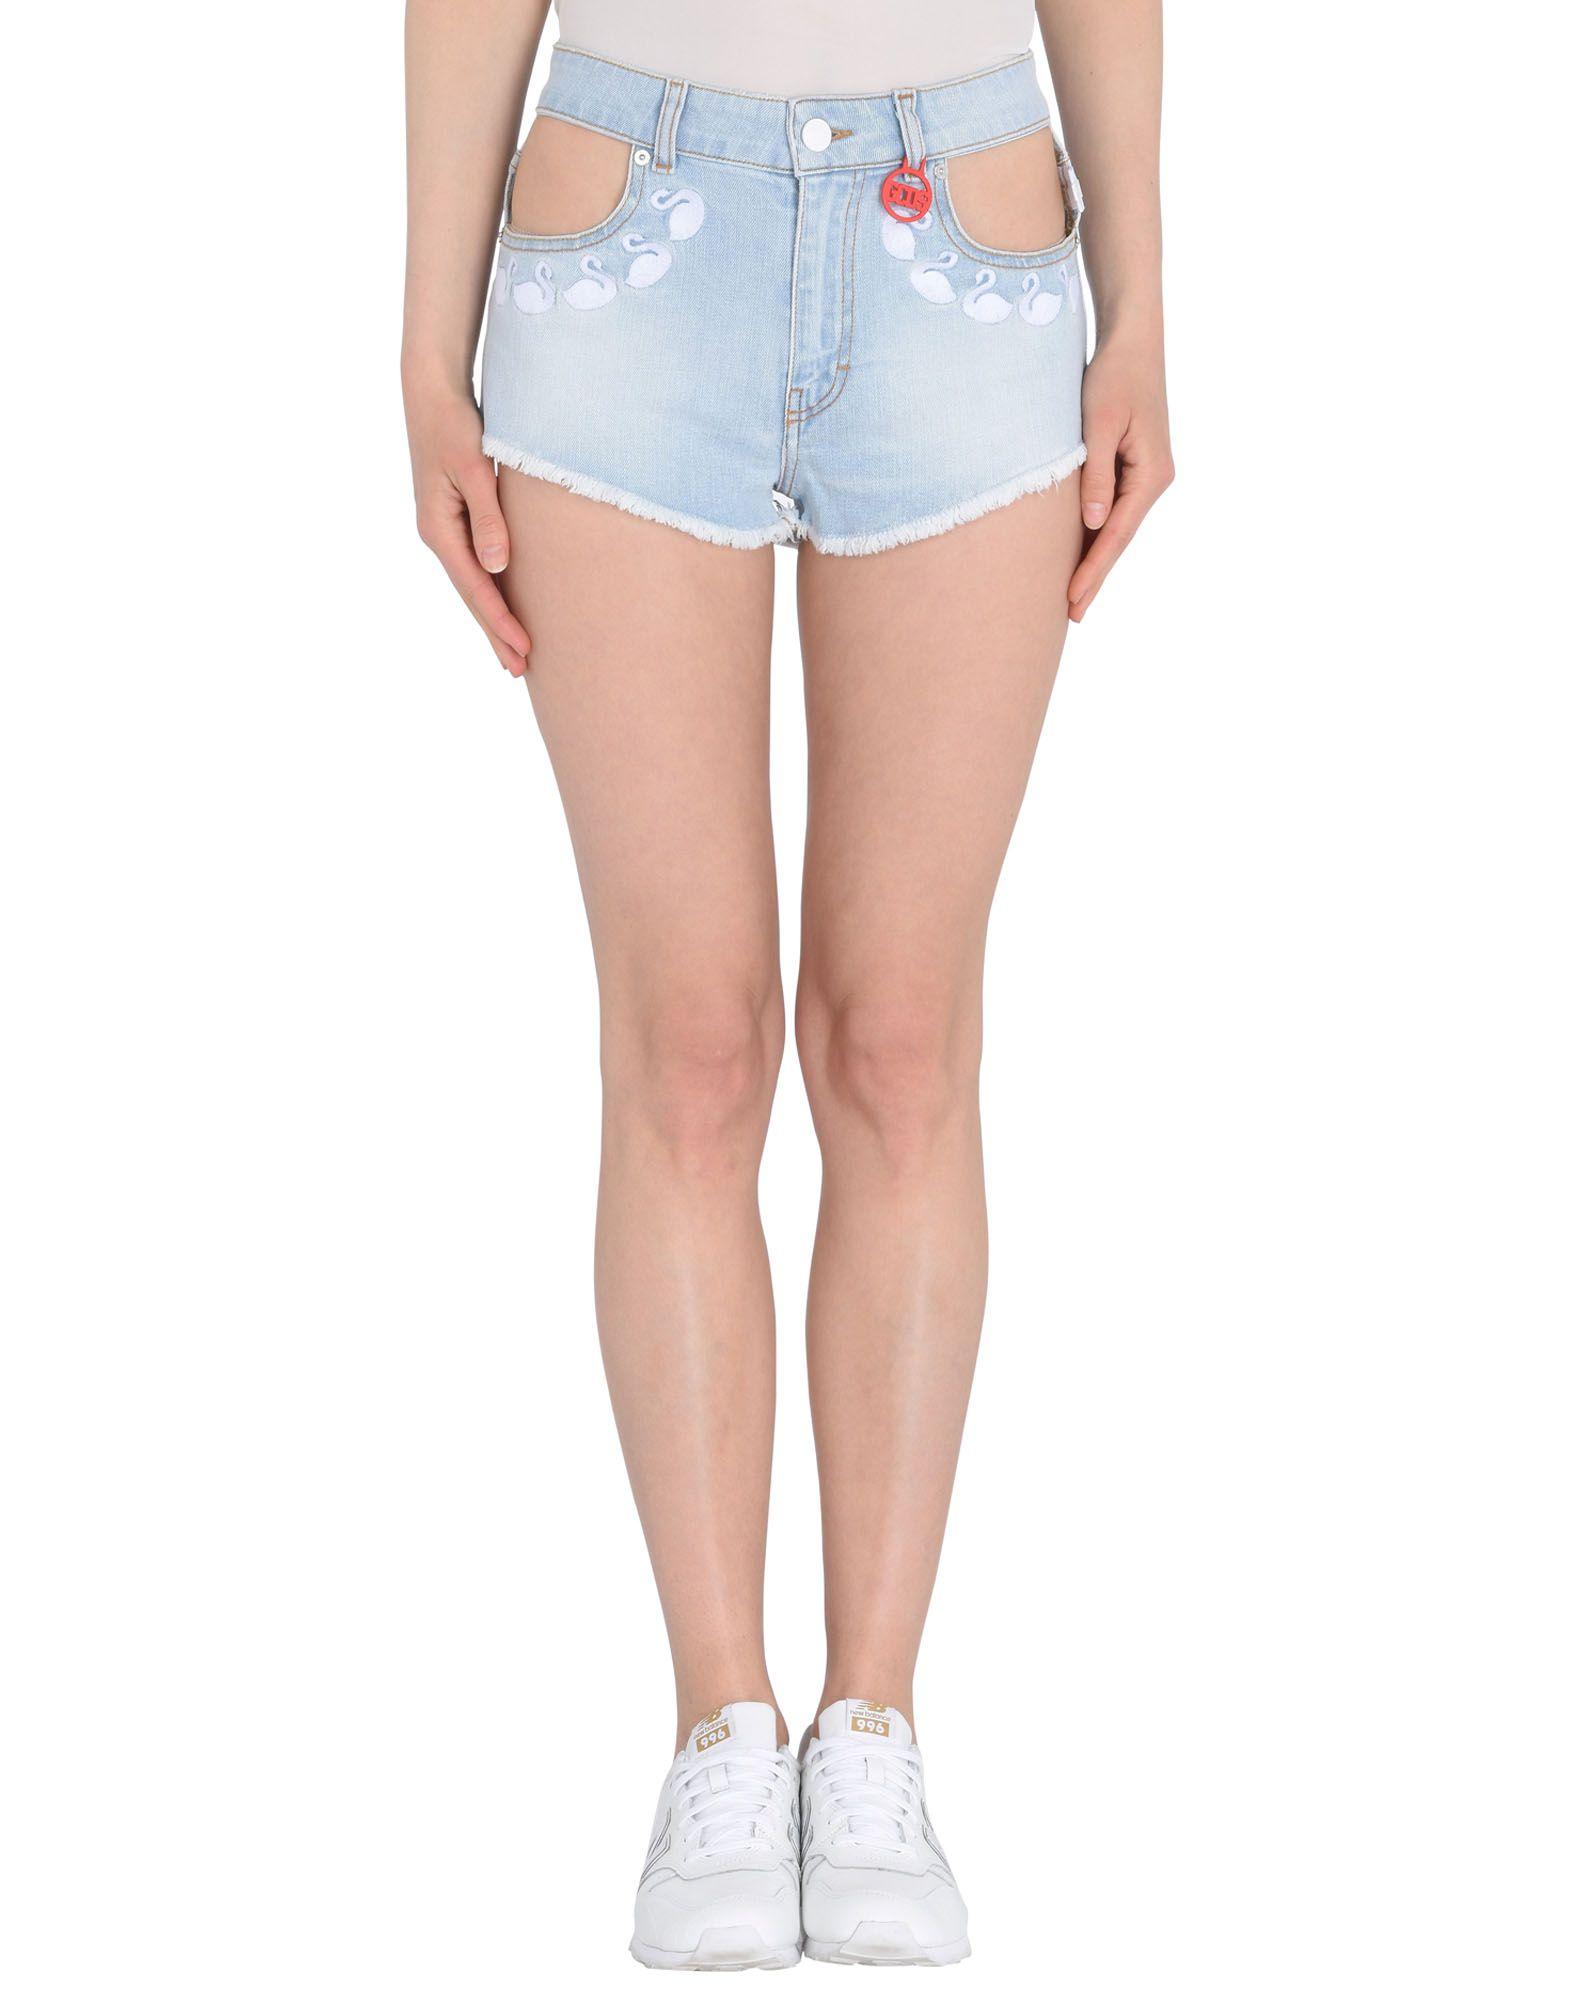 GCDS Denim shorts. denim, embroidered detailing, logo, basic solid color, light wash, mid rise, front closure, button, zip, multipockets, fringed hem, stretch. 98% Cotton, 2% Elastane